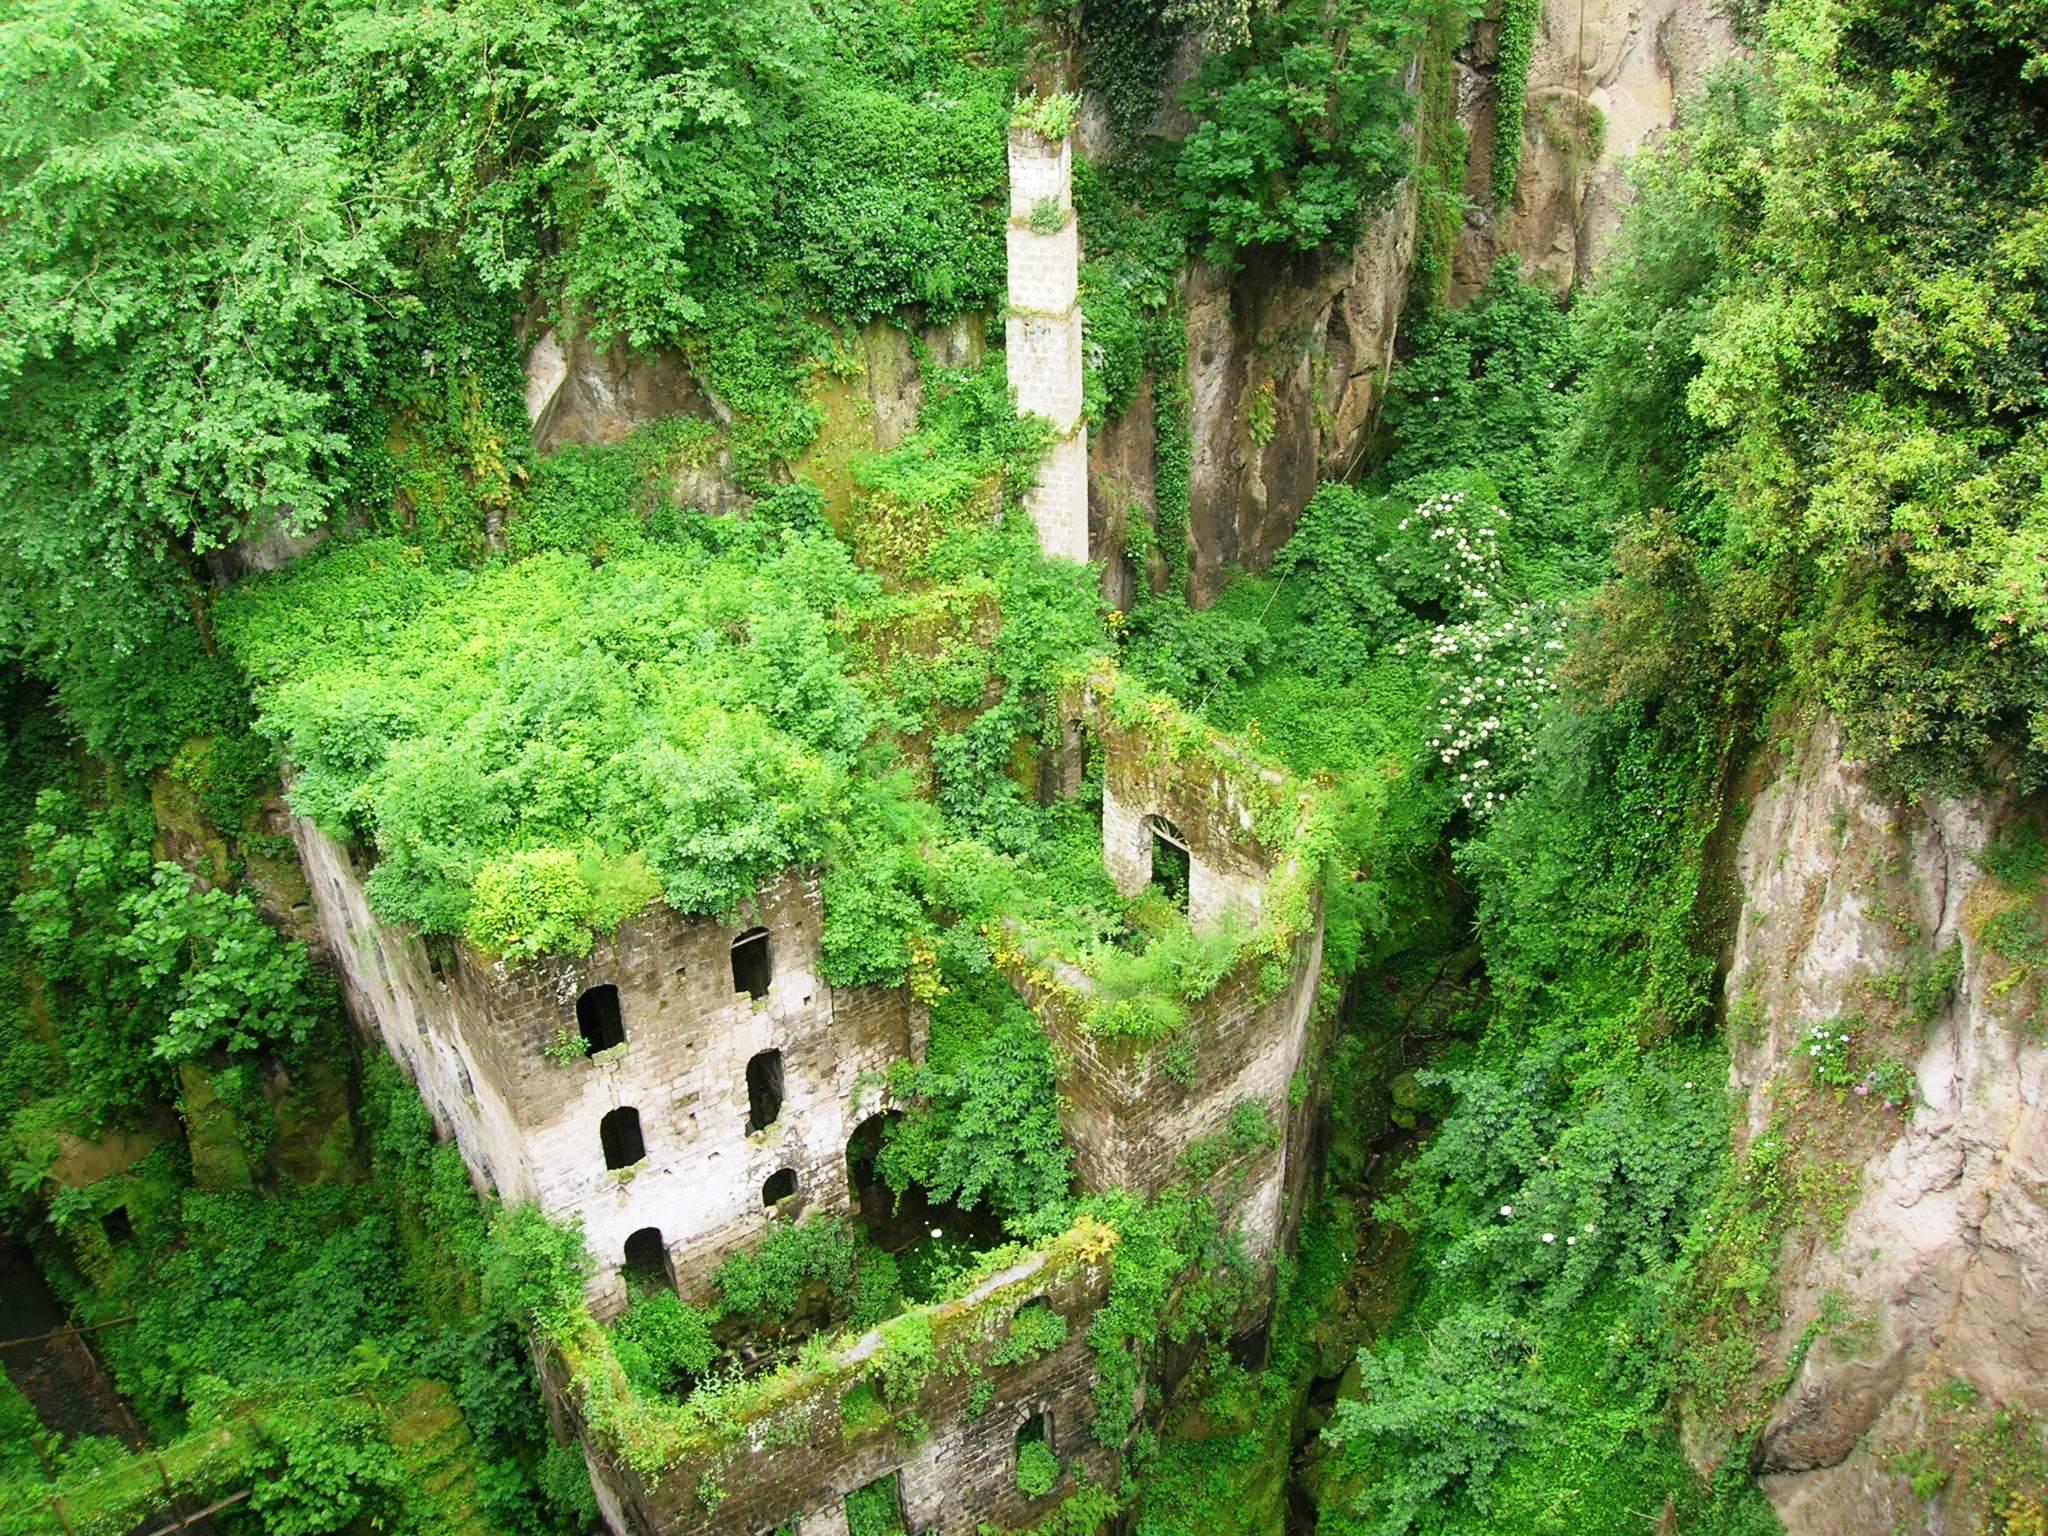 Nature Vs Civilization